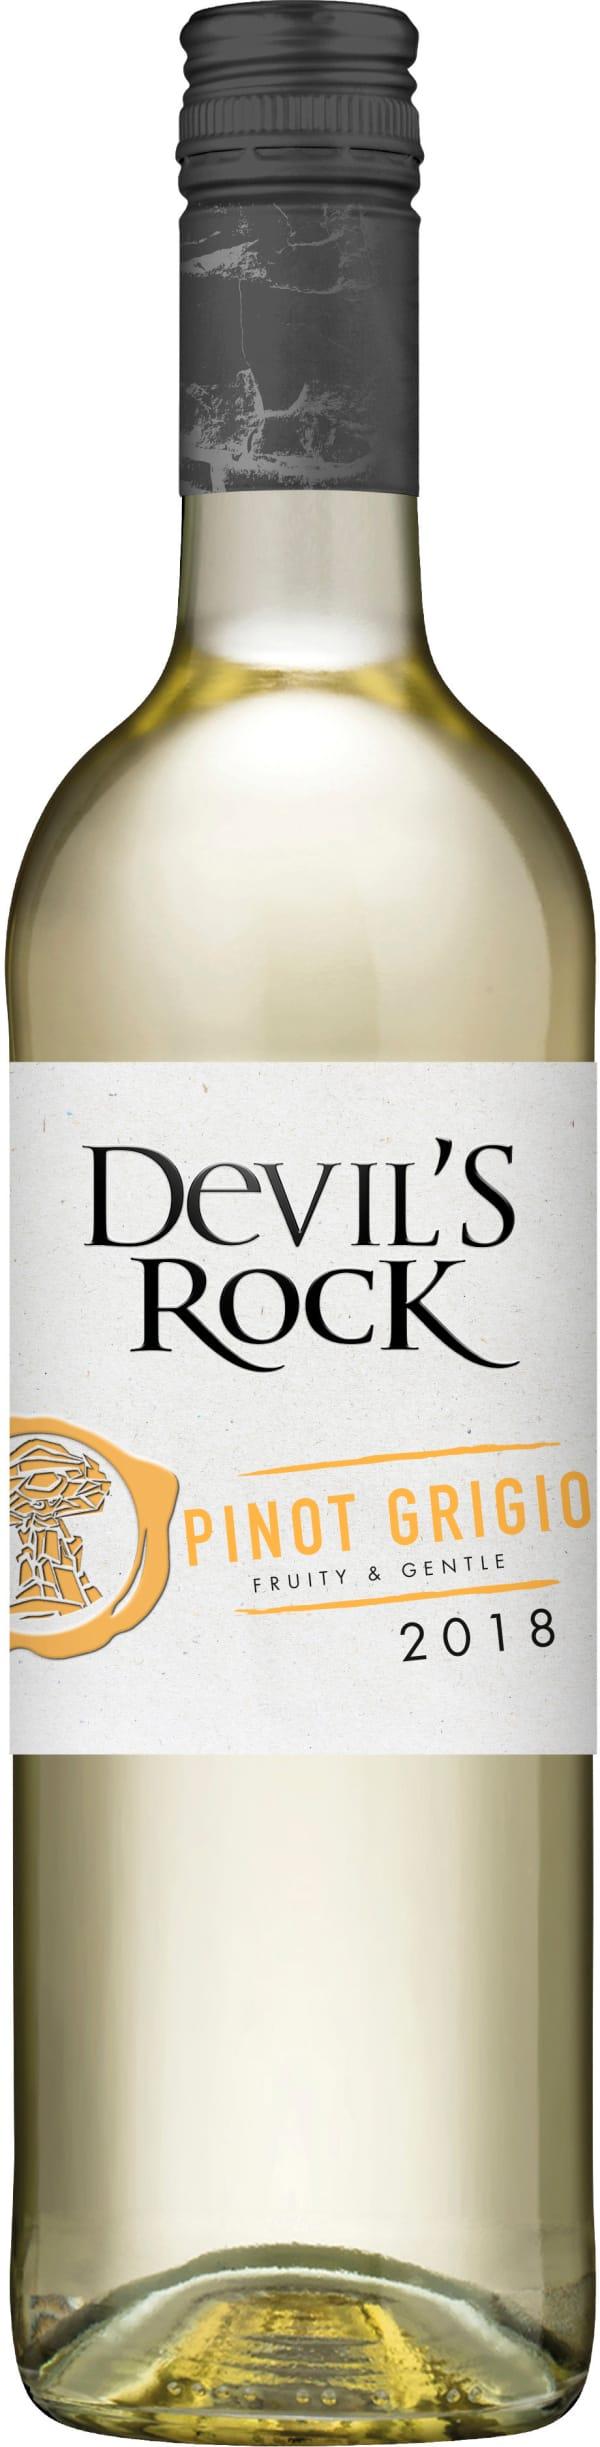 Devil's Rock Pinot Grigio 2019